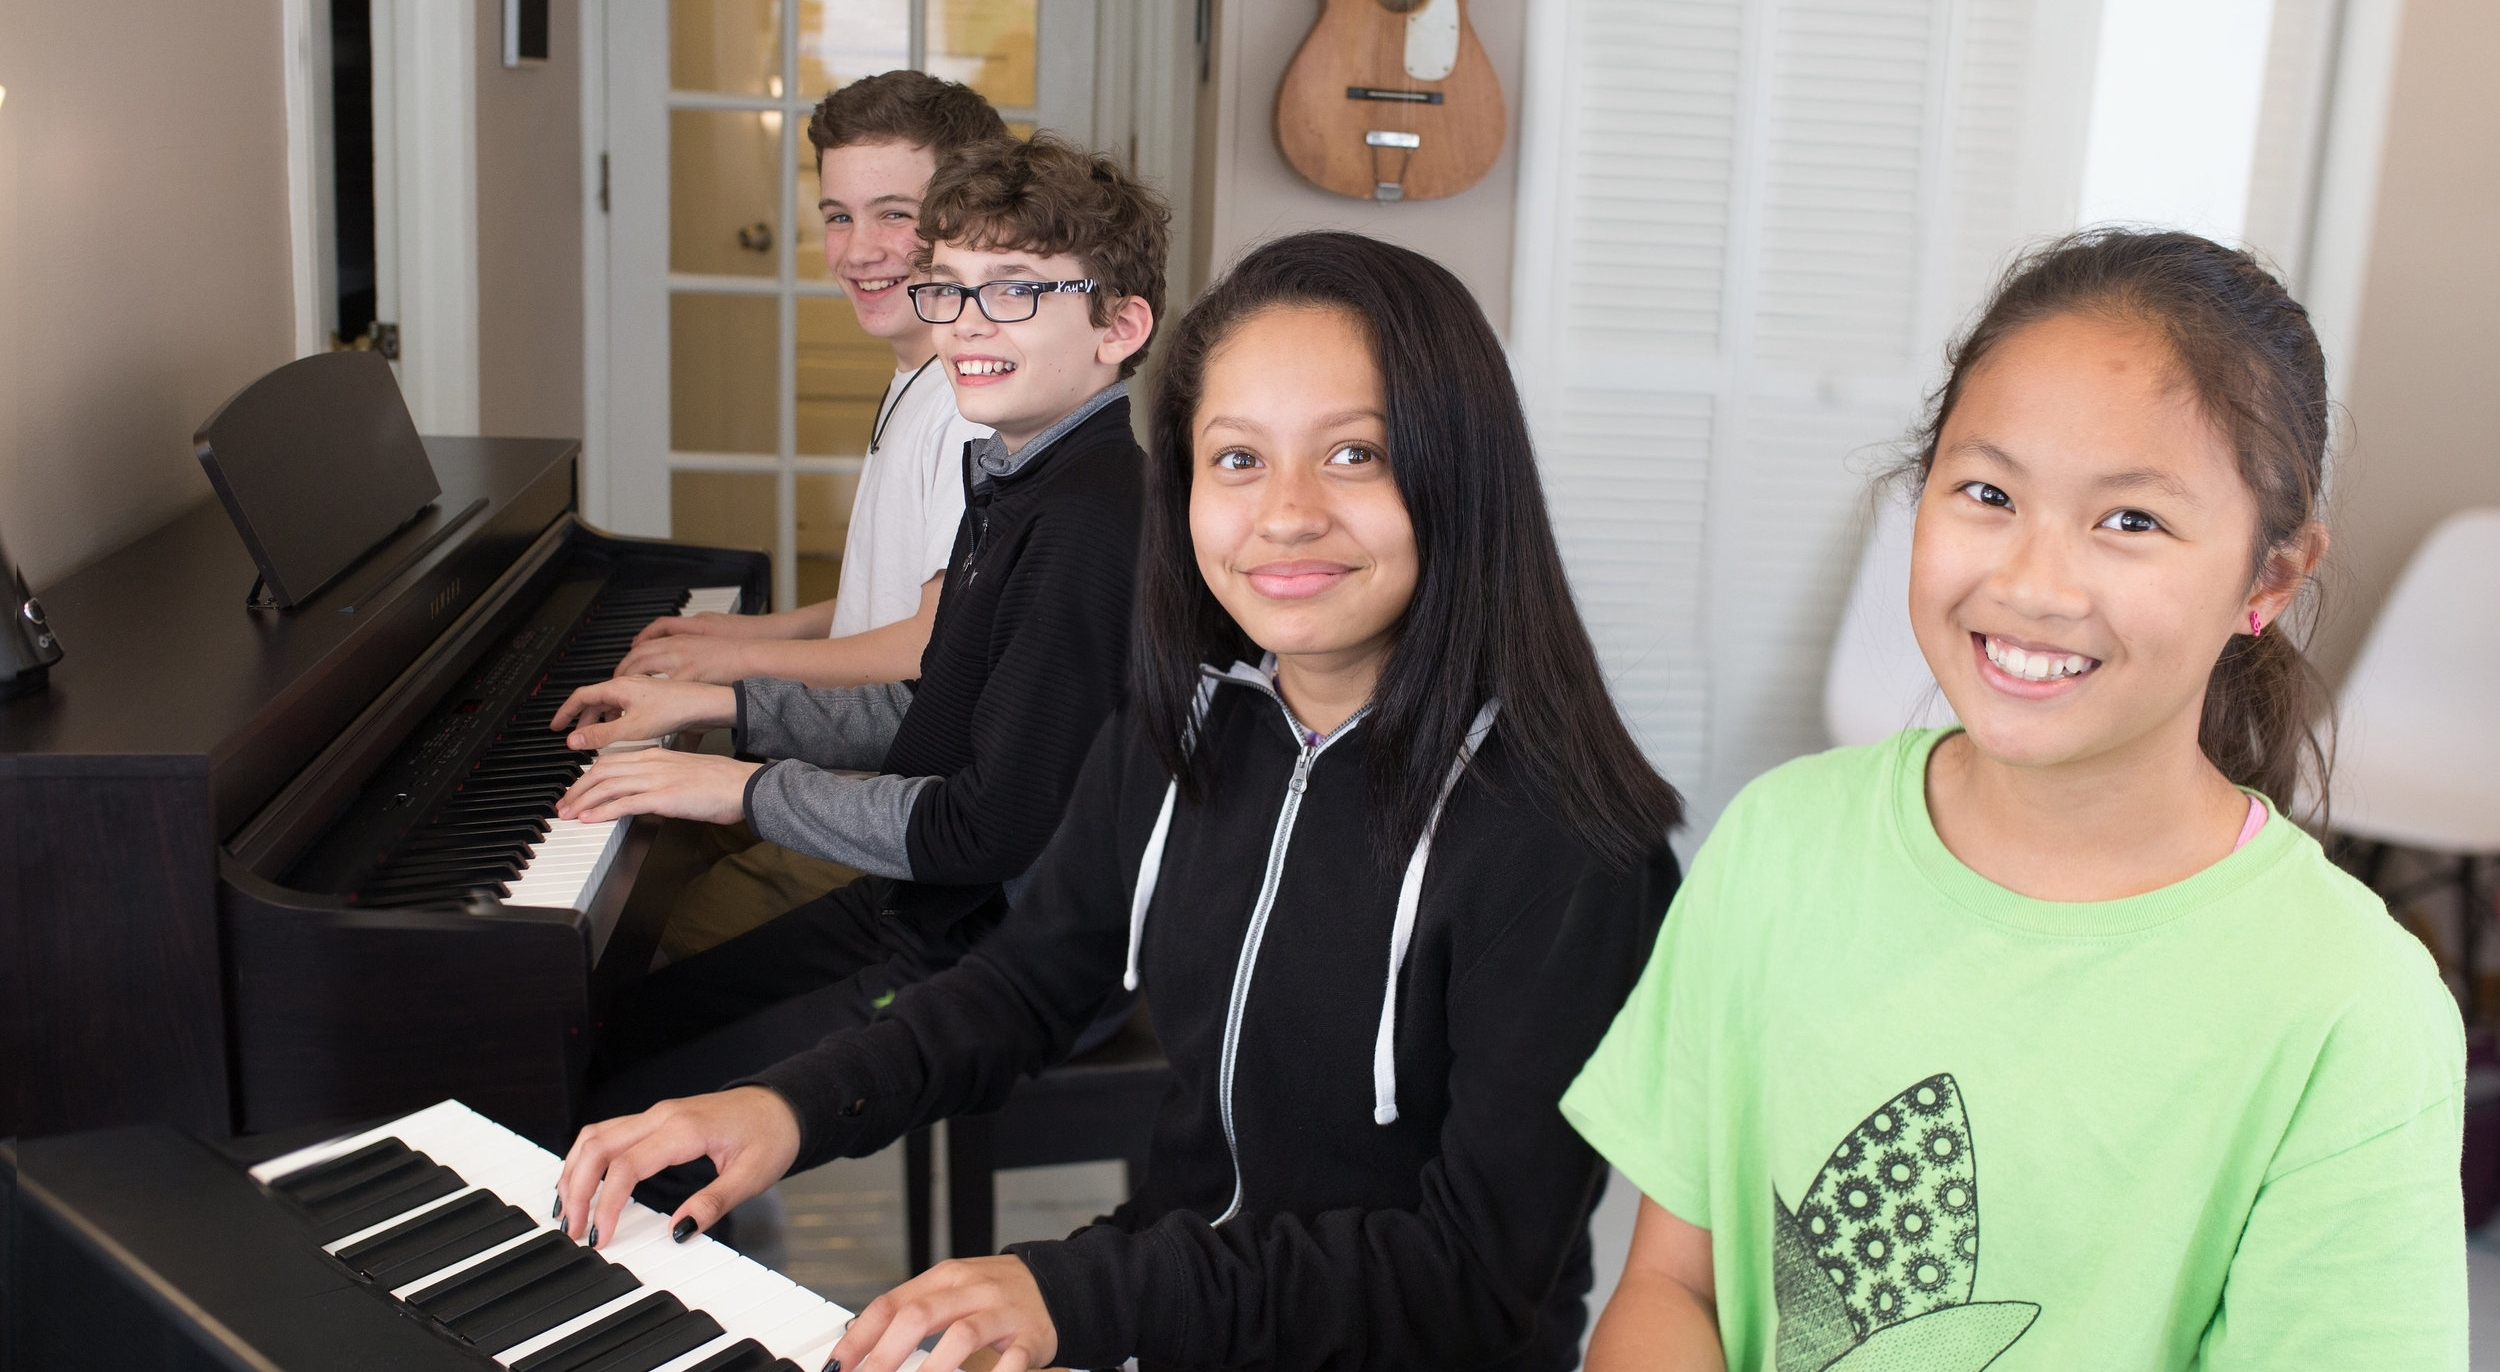 teen group playing piano